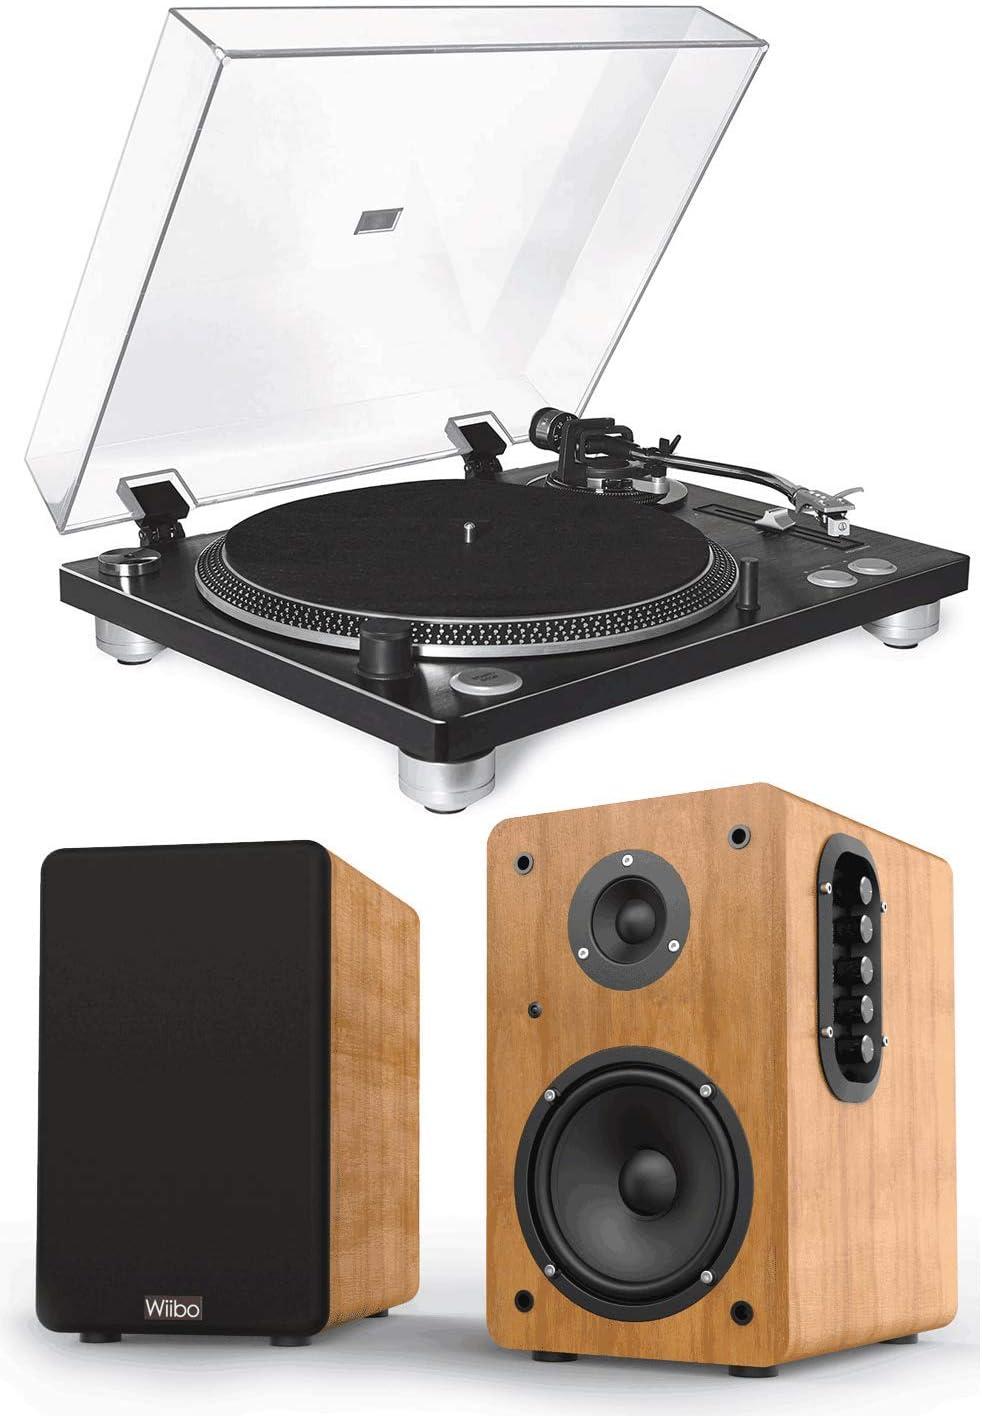 Wiibo Equipo HiFi Giradiscos Fonestar Vinyl 12U Linea/Phono ...